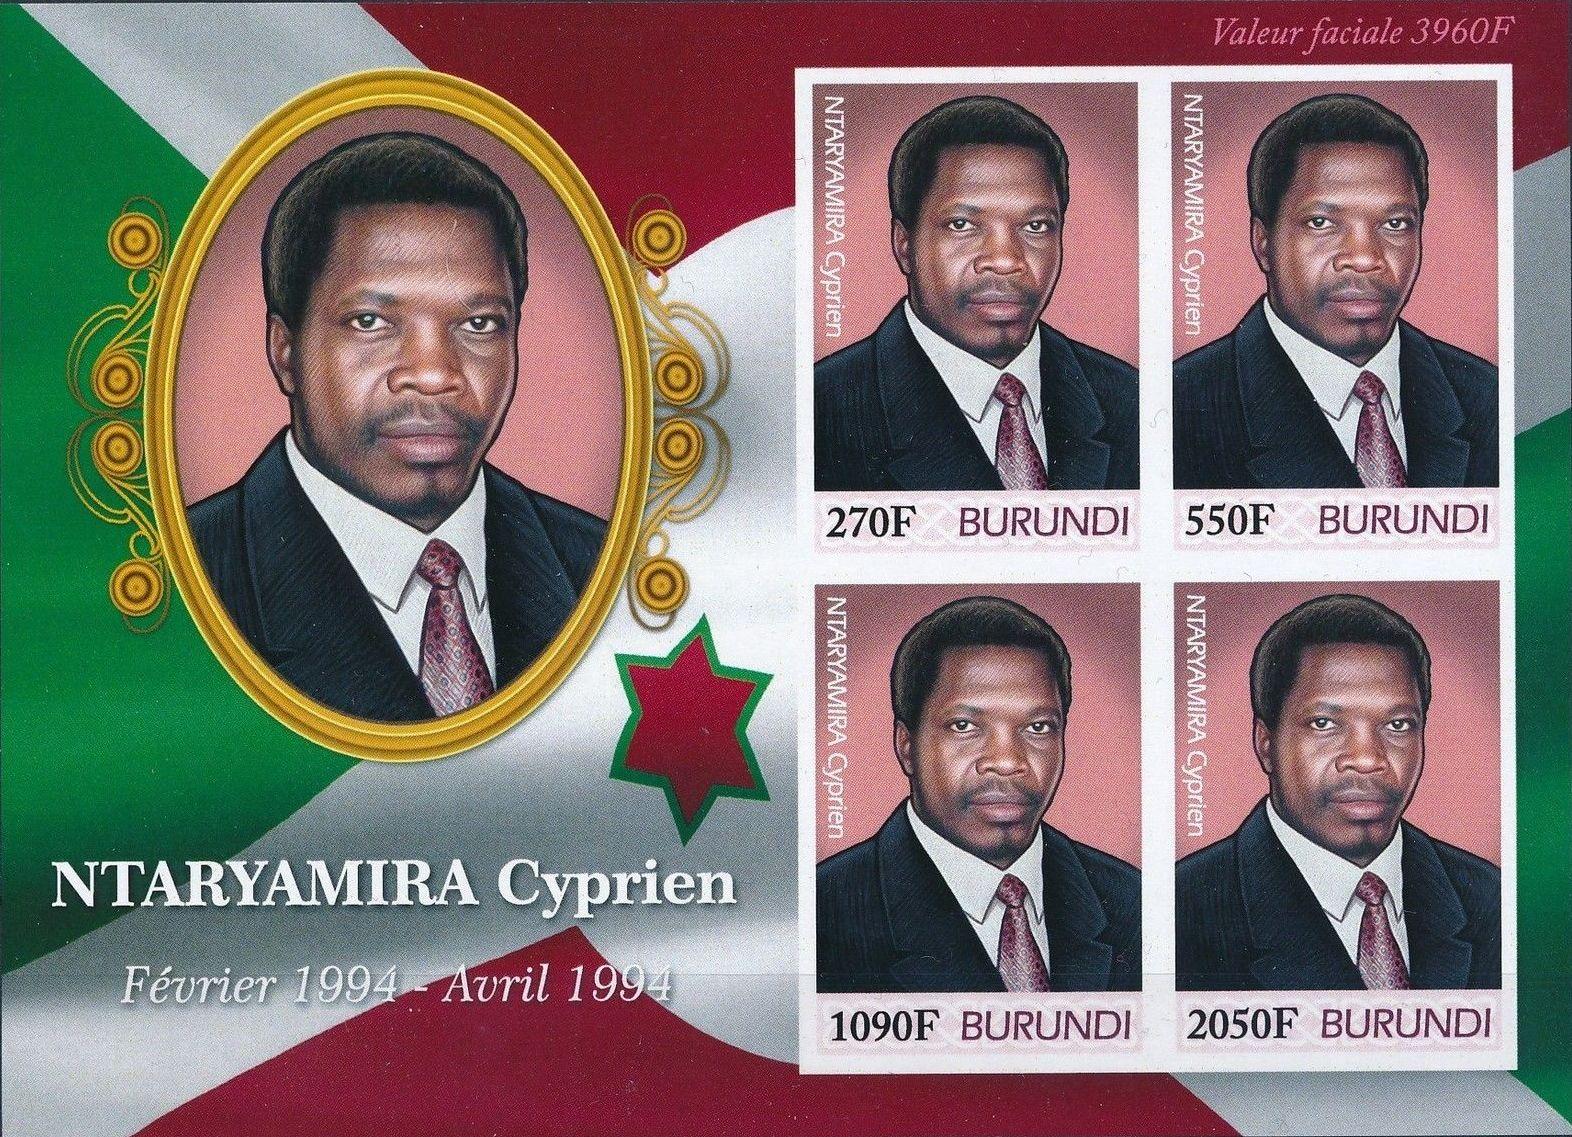 Burundi 2012 Presidents of Burundi - Cyprien Ntaryamira h.jpg